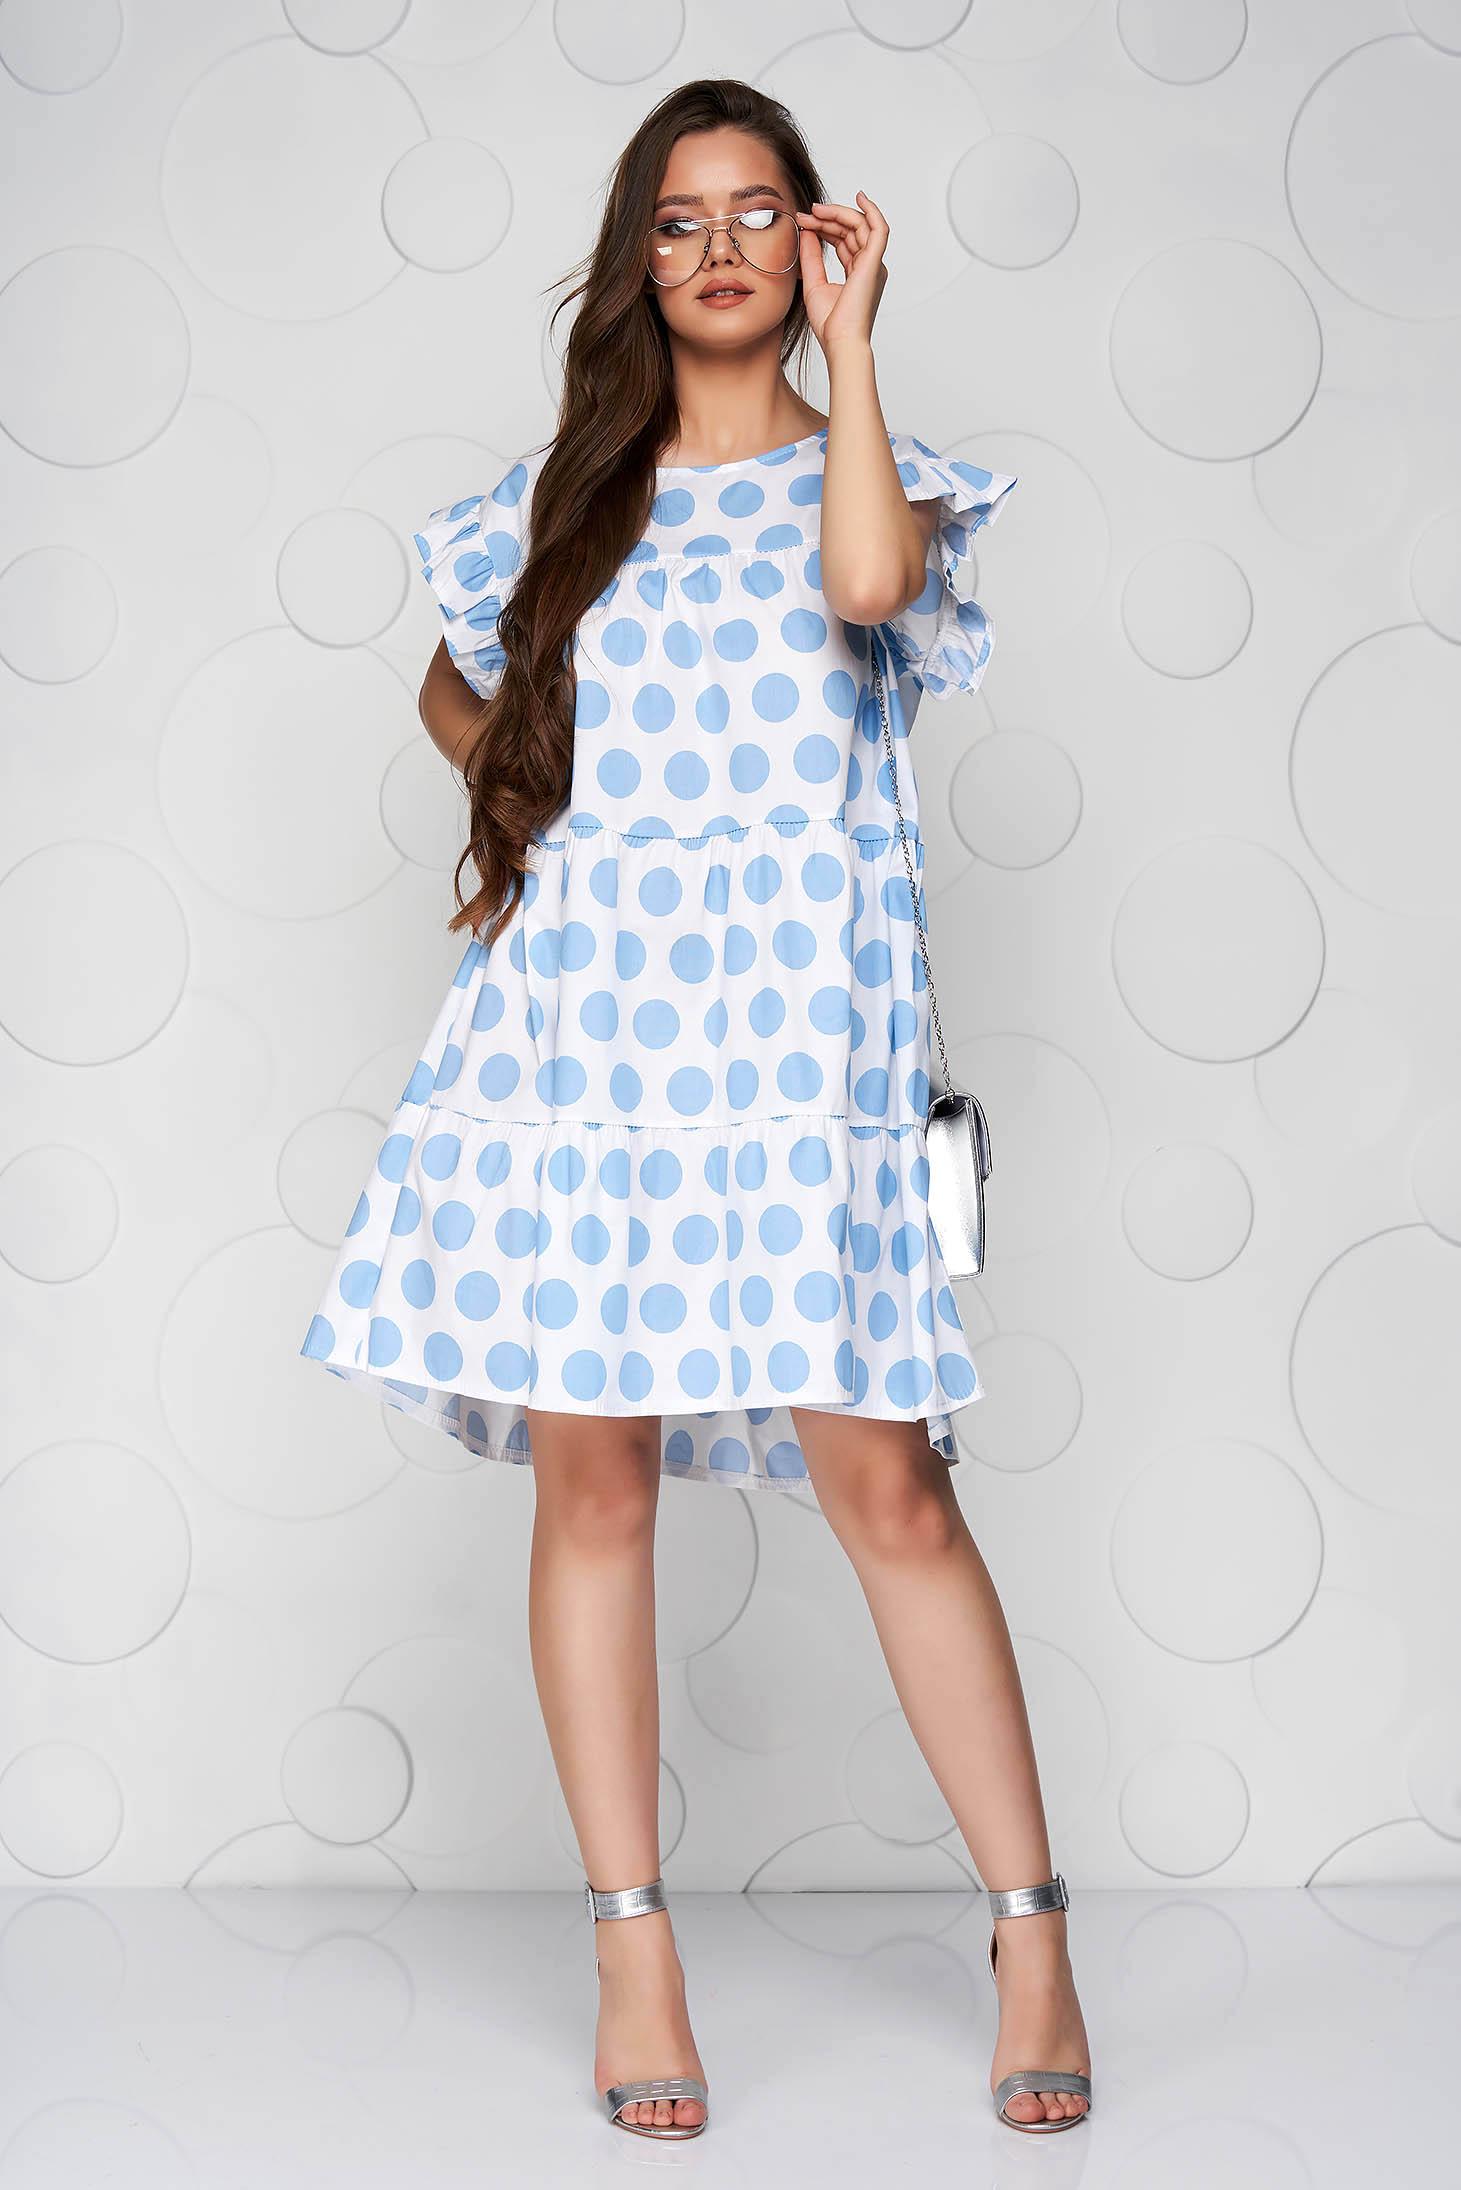 Blue dress dots print loose fit with ruffle details short cut poplin, thin cotton